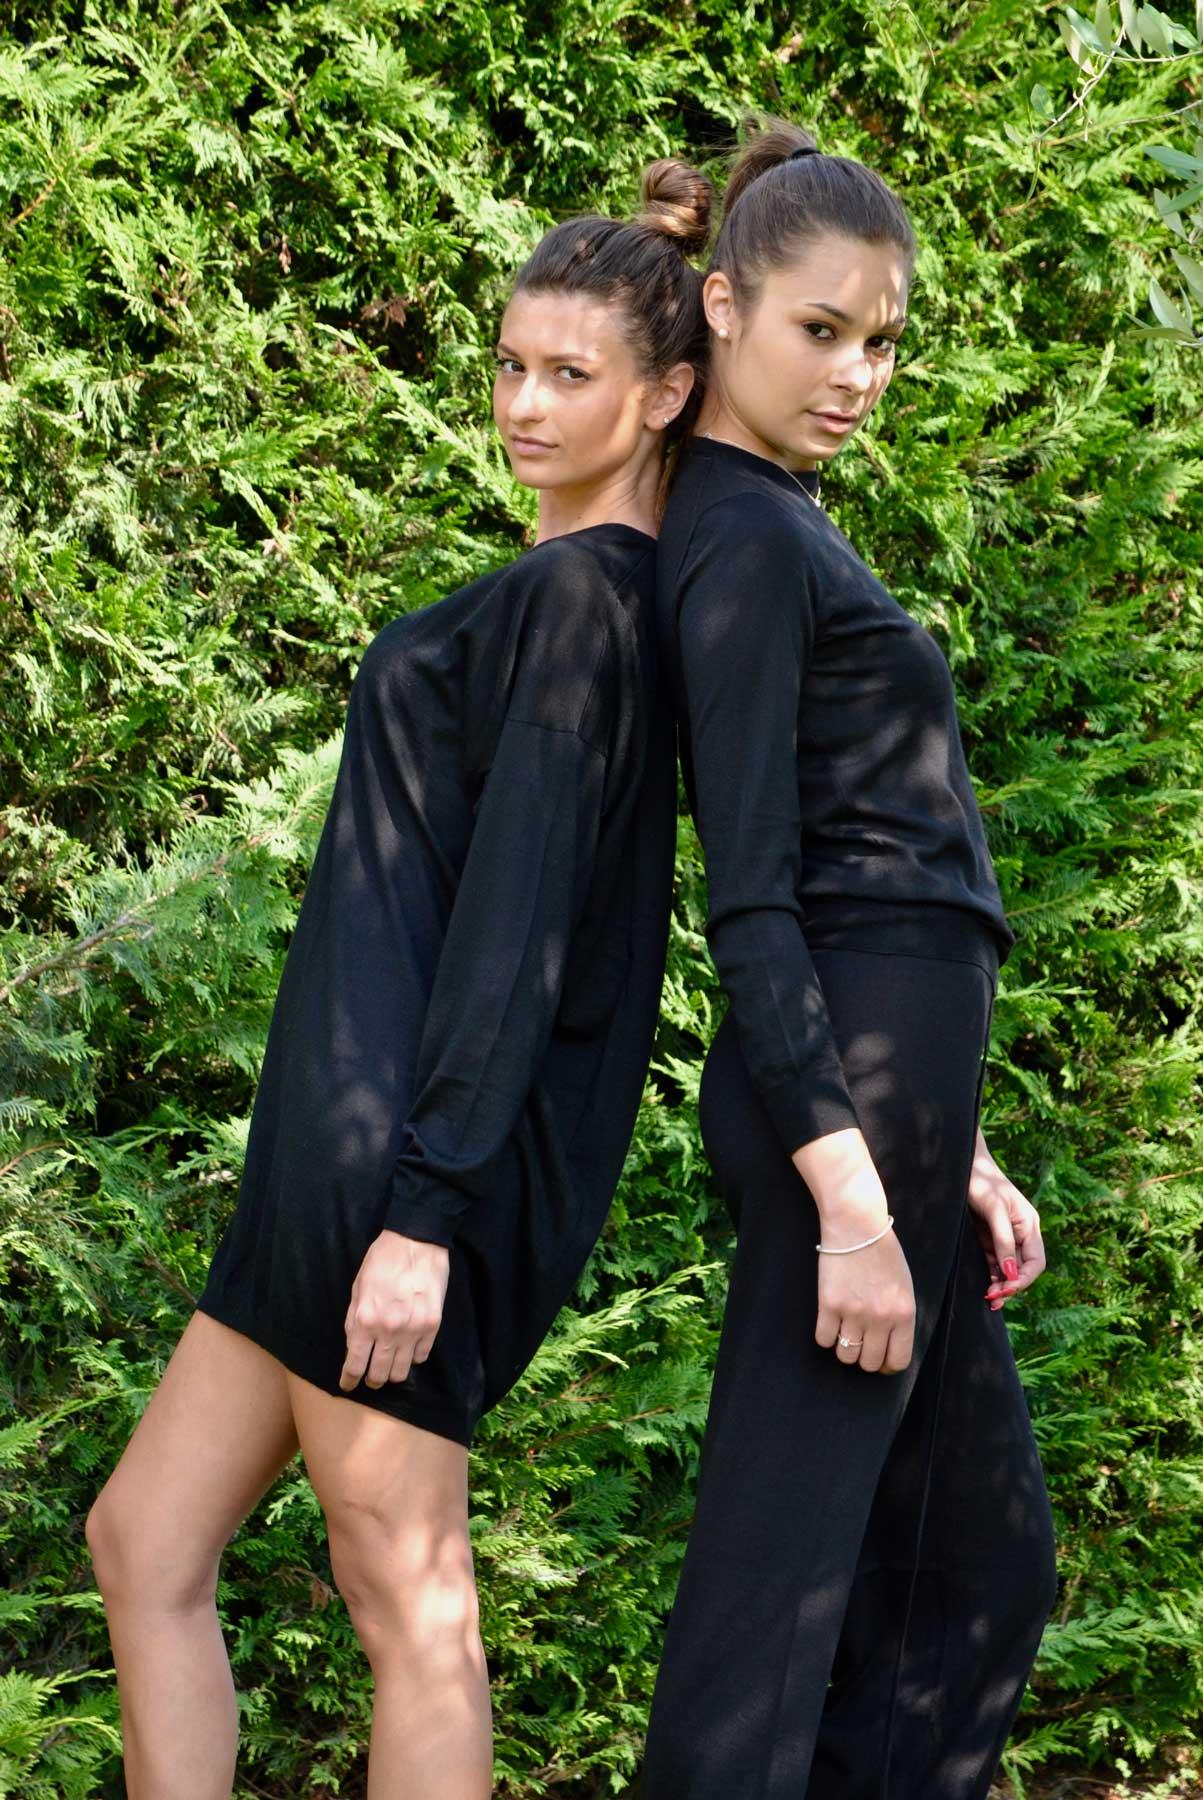 matteo-perin-women-clothing-dress-011.jpg